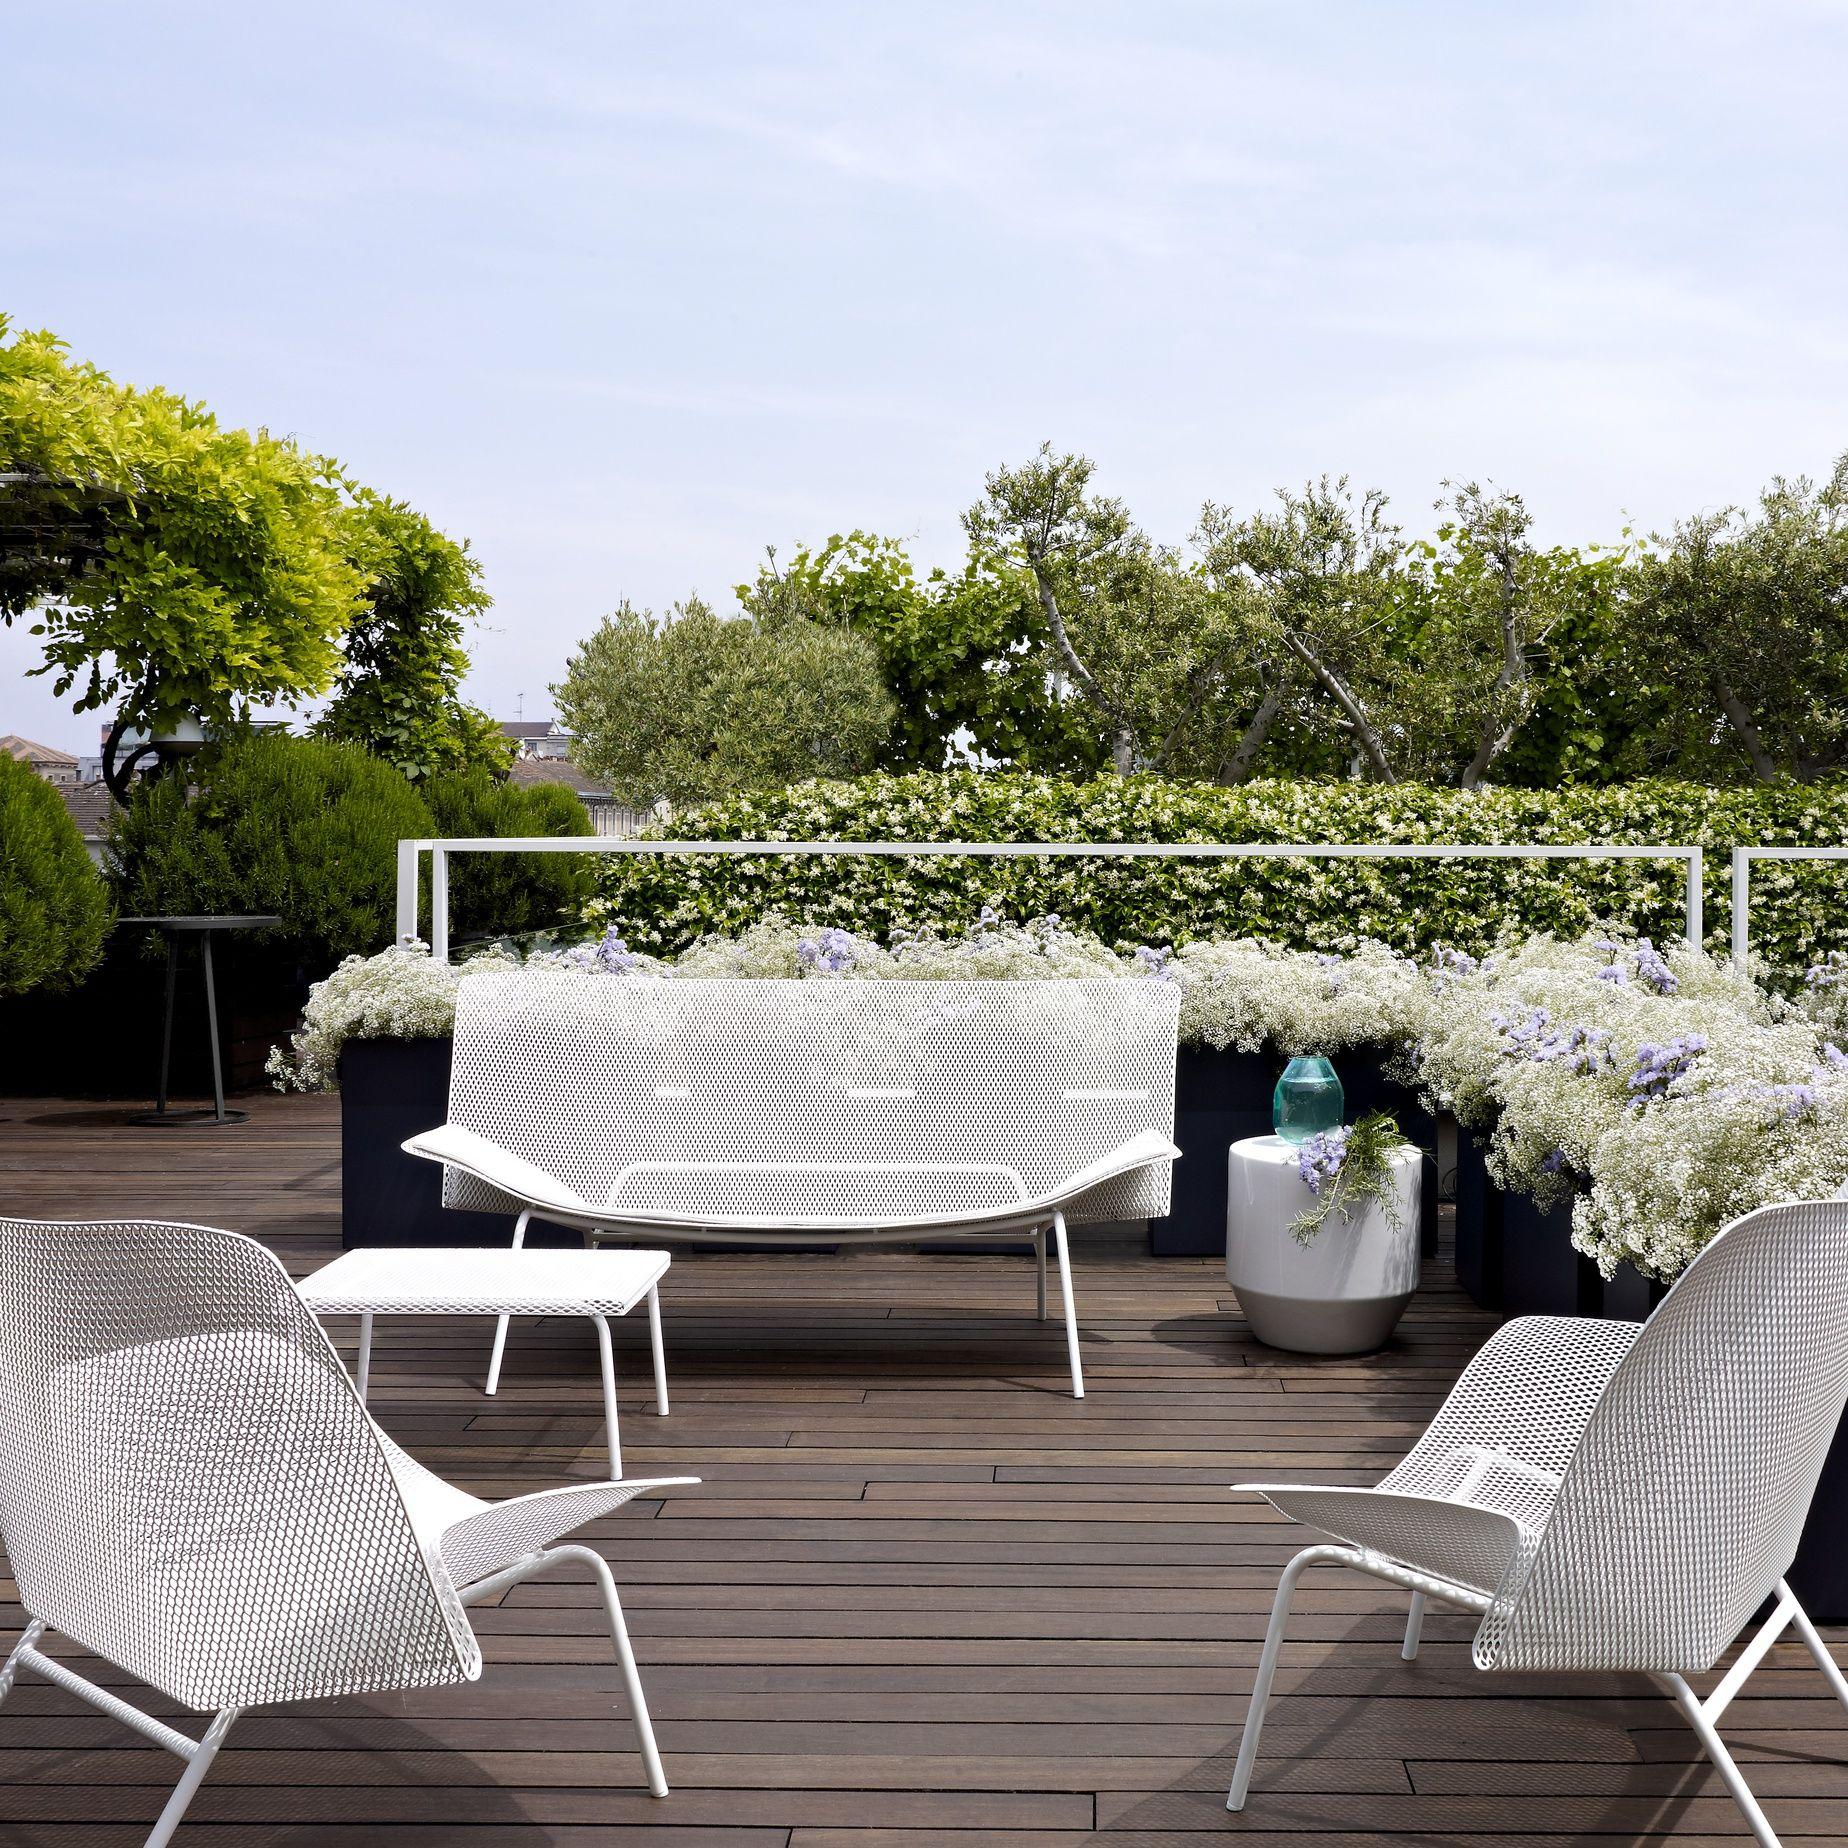 Grillage, Sofas Designer : François Azambourg | Ligne Roset